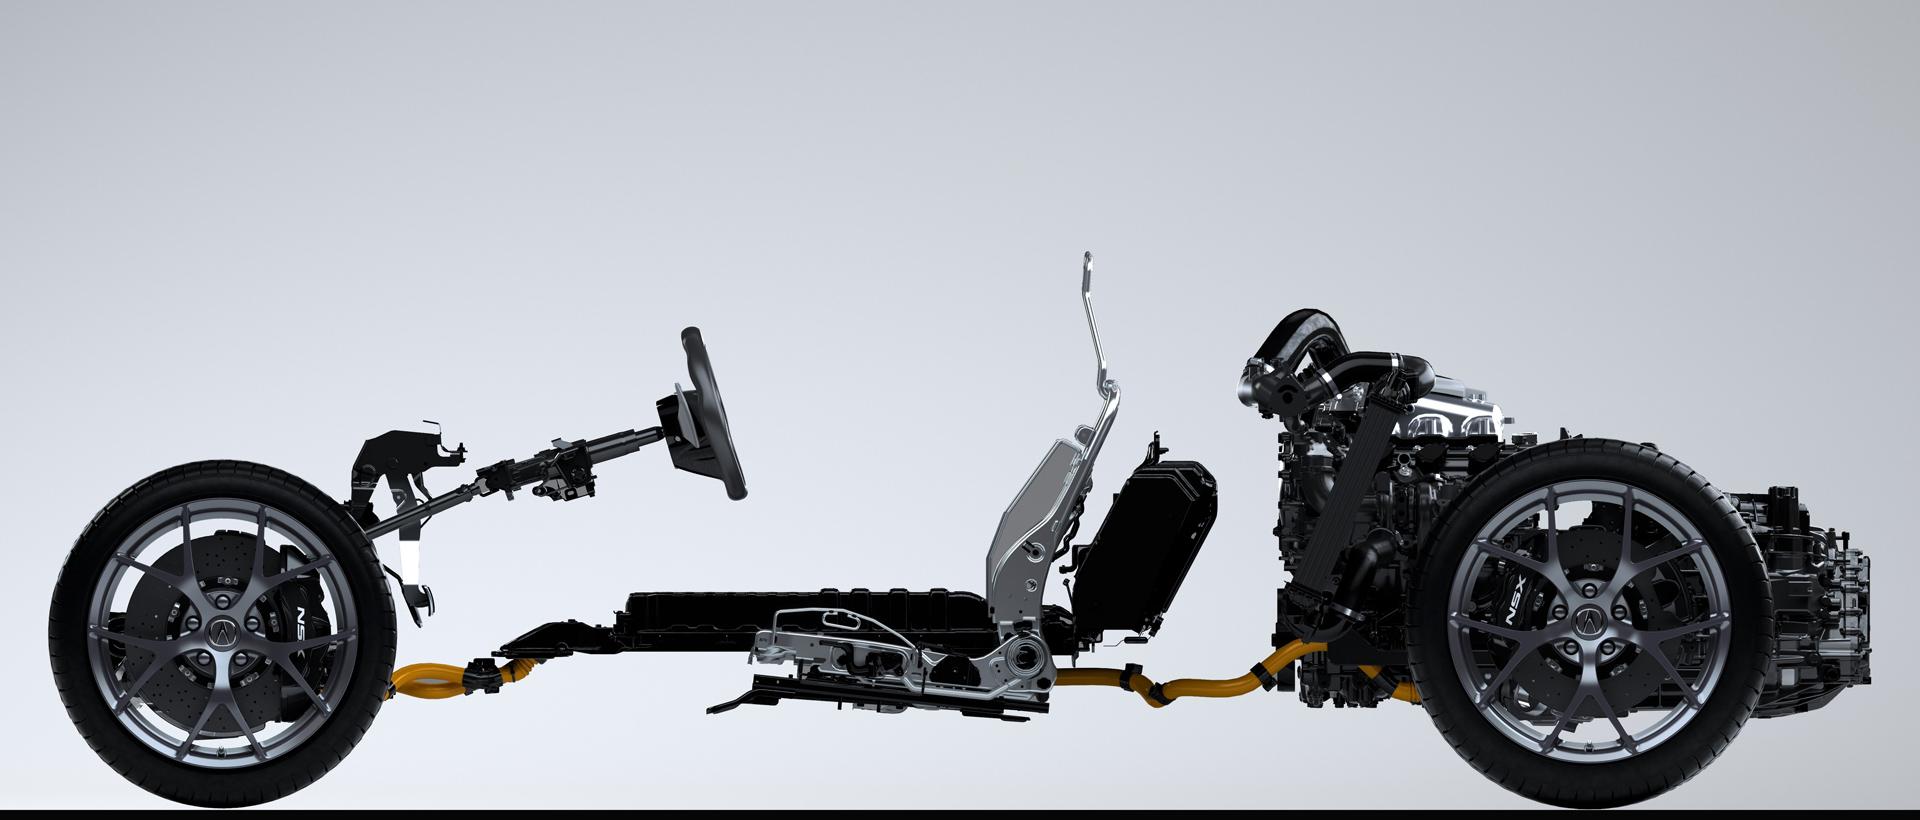 NSX - châssis + moteurs - Acura Honda